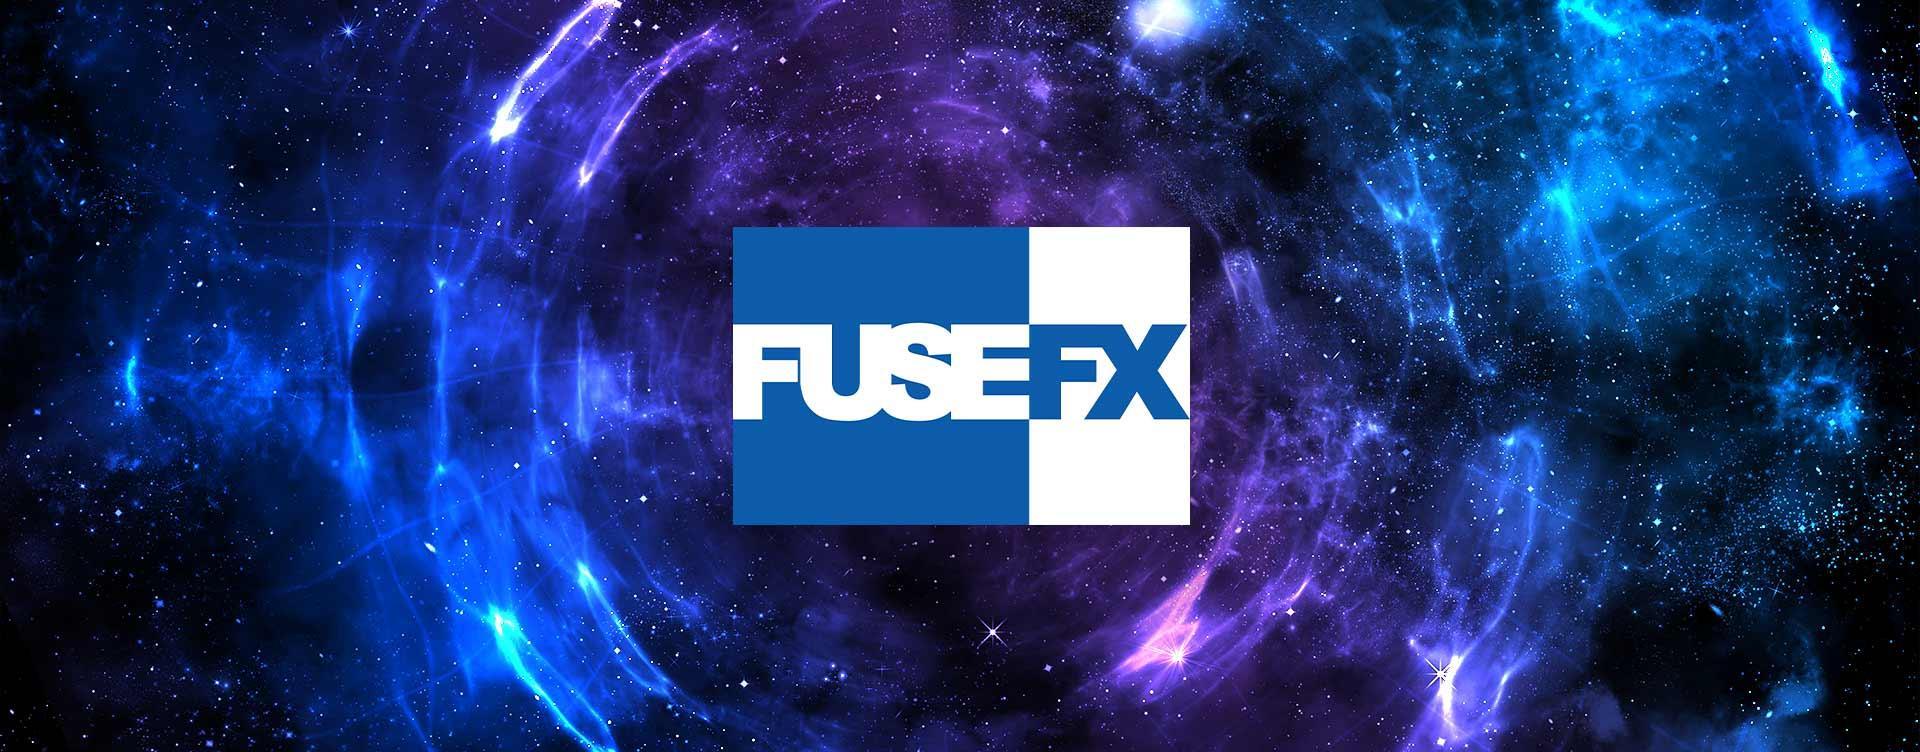 FuseFX 911 header